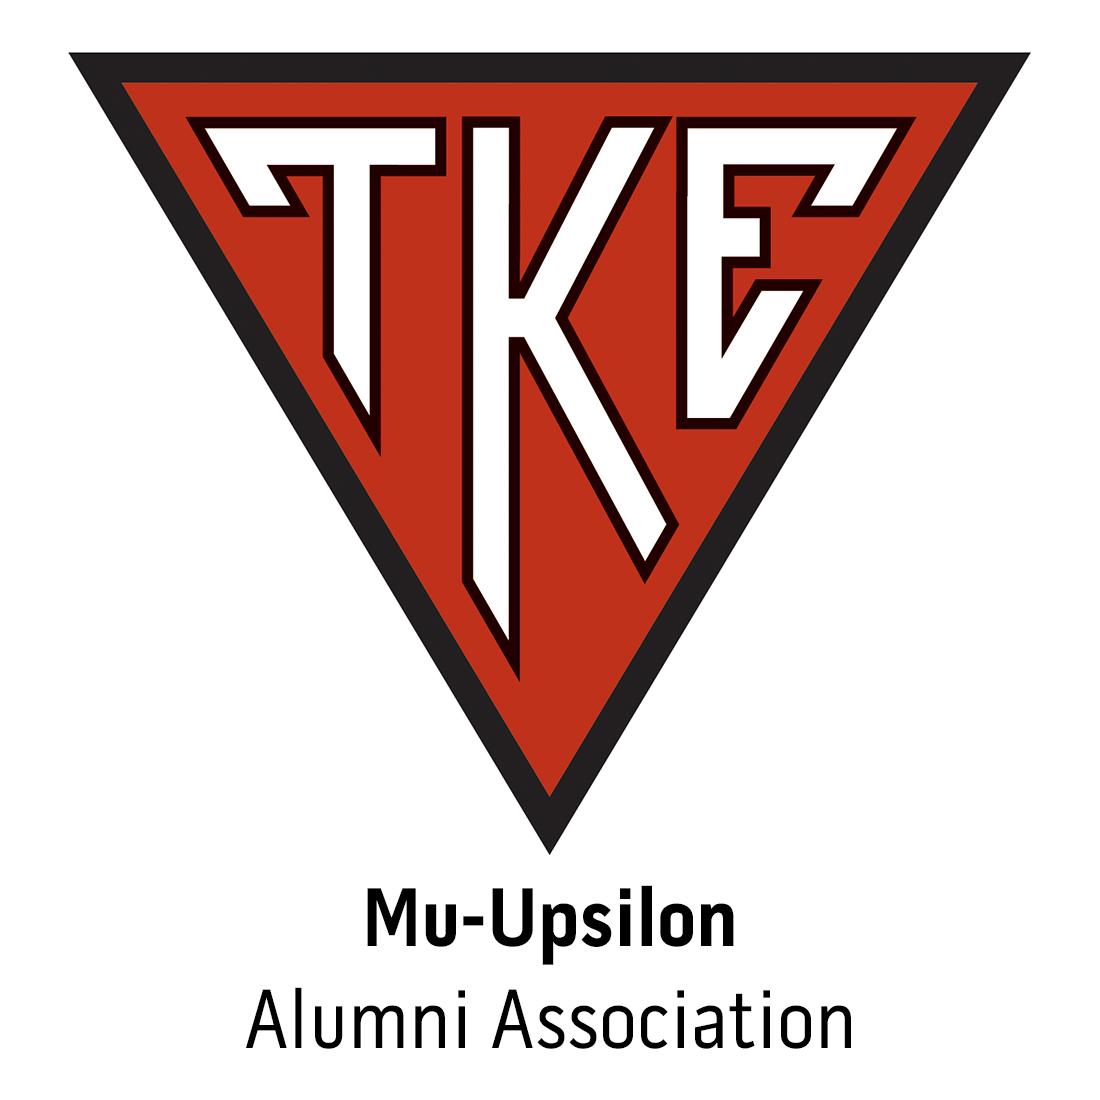 Mu-Upsilon Alumni Association Alumni at Illinois State University